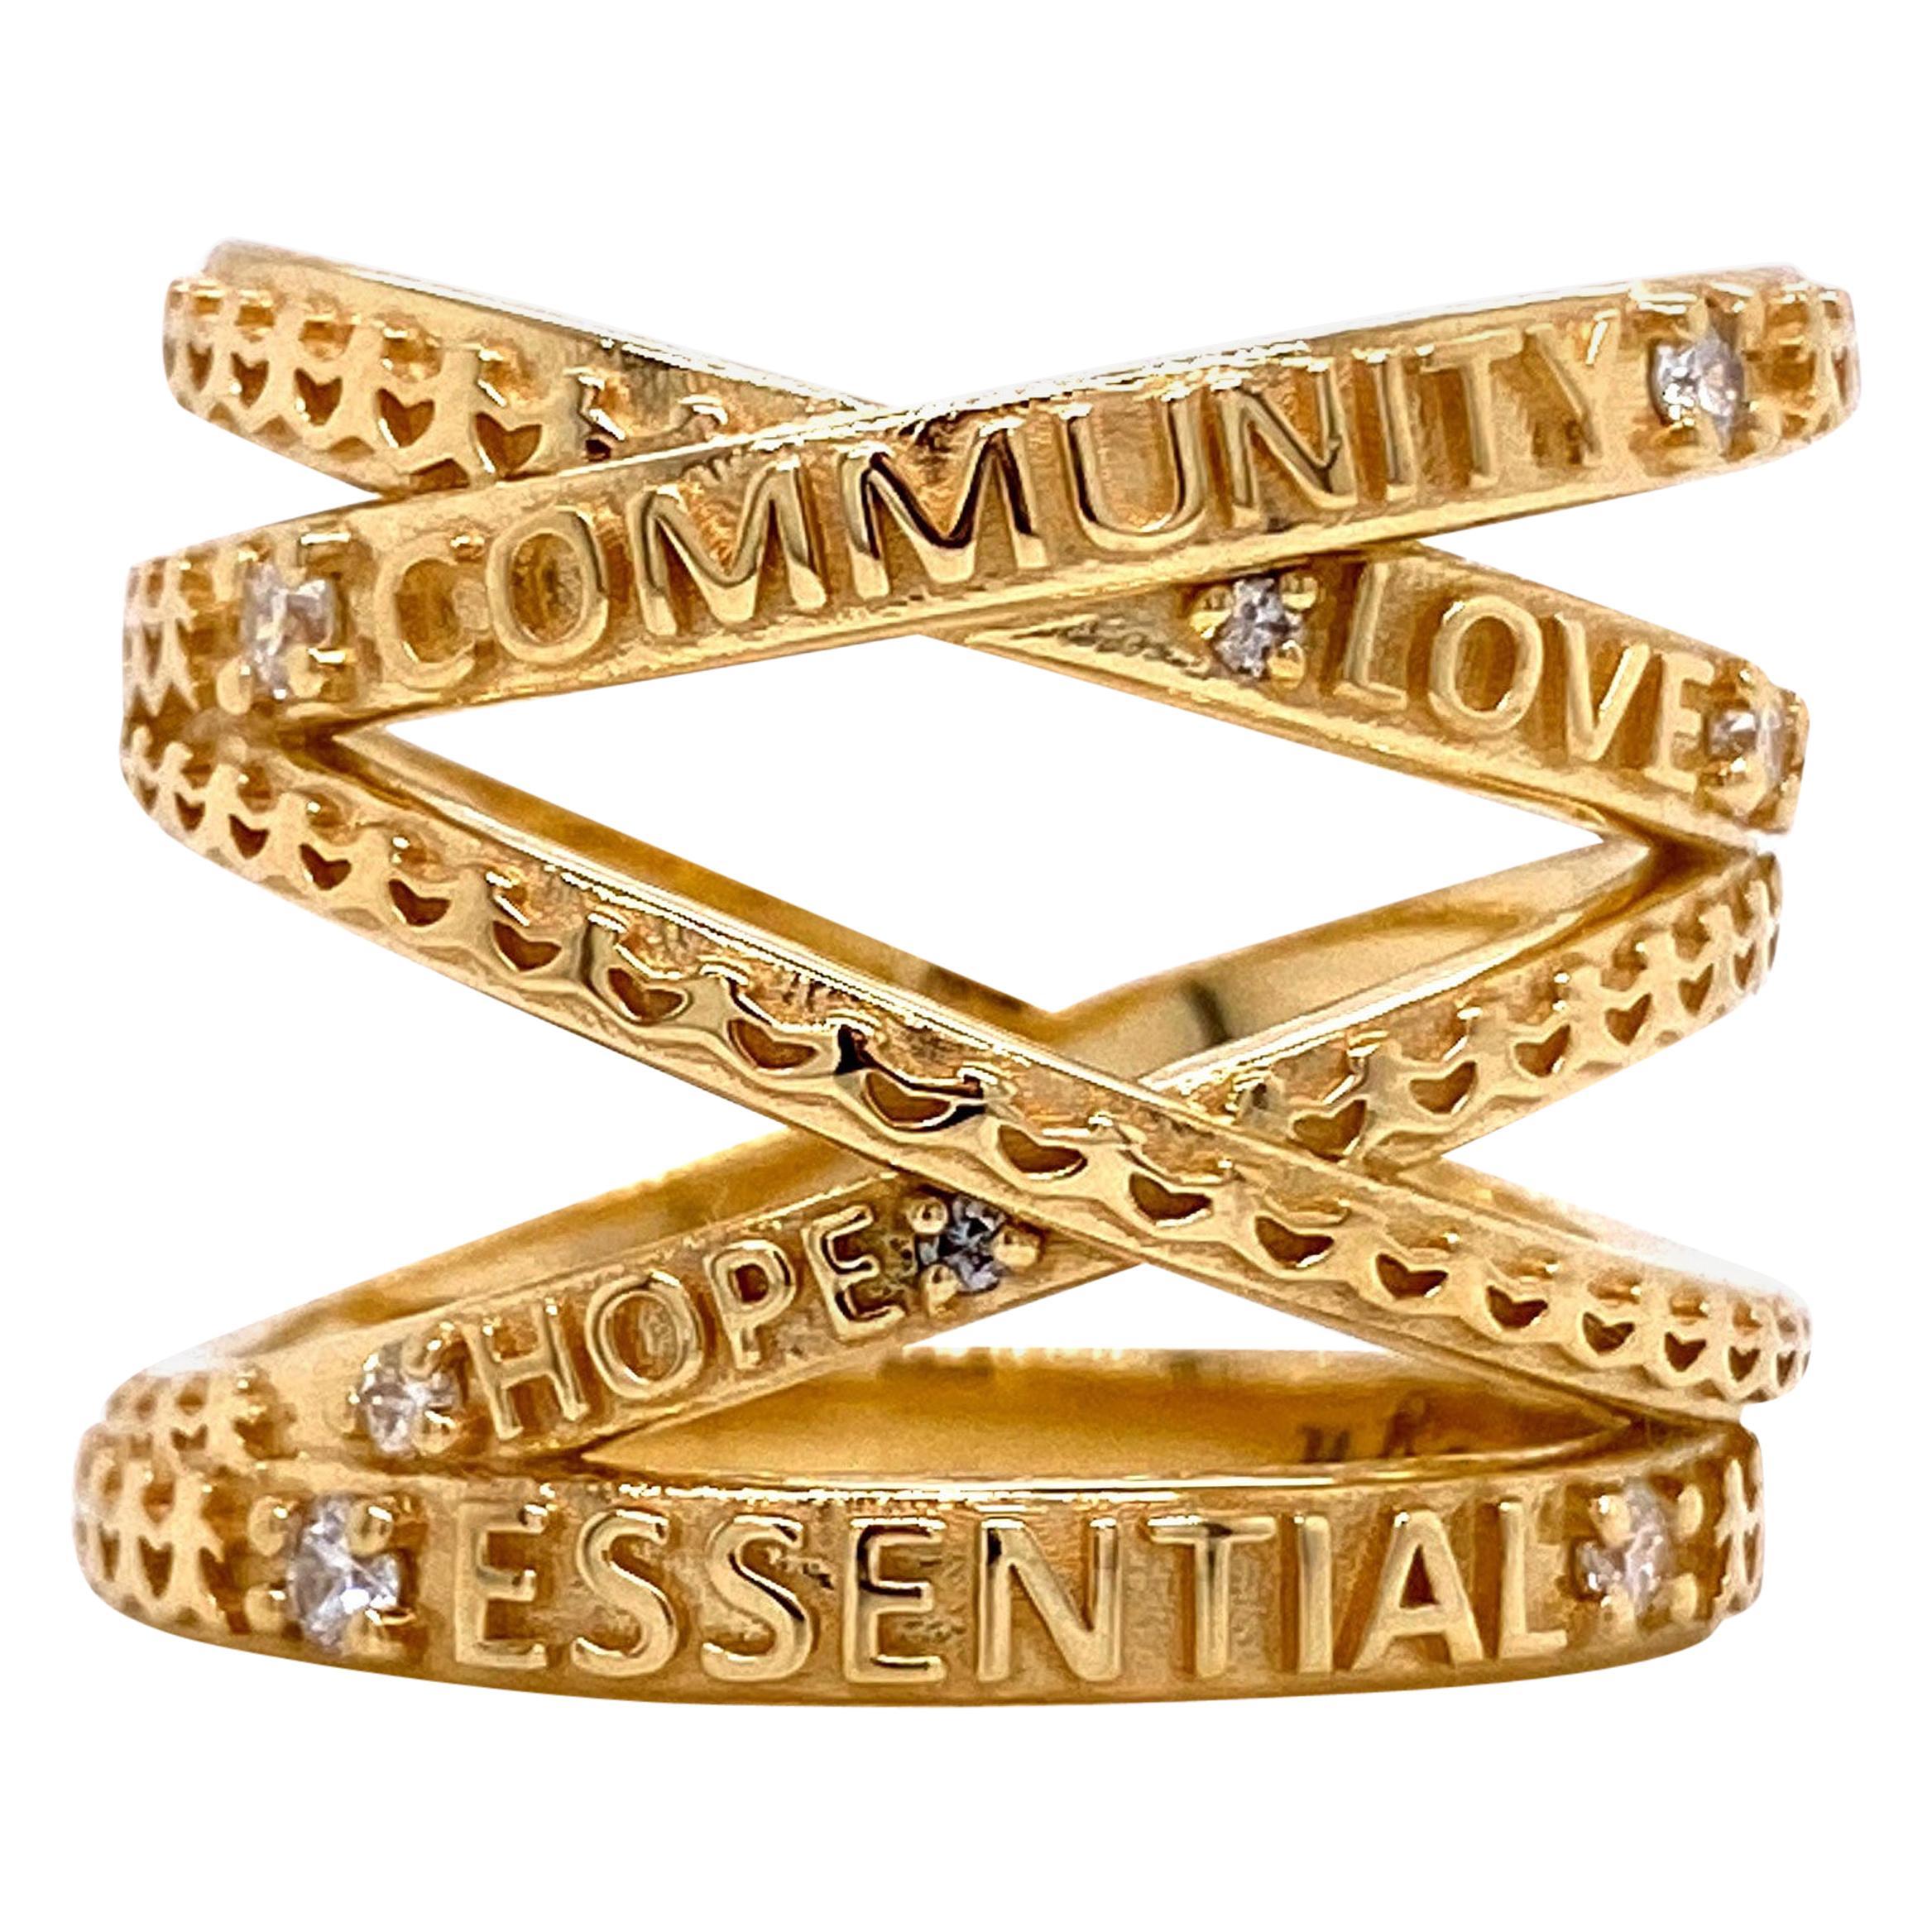 "18 Karat Yellow Gold ""Not Non-Essential"" Wrap Ring with White Diamonds"